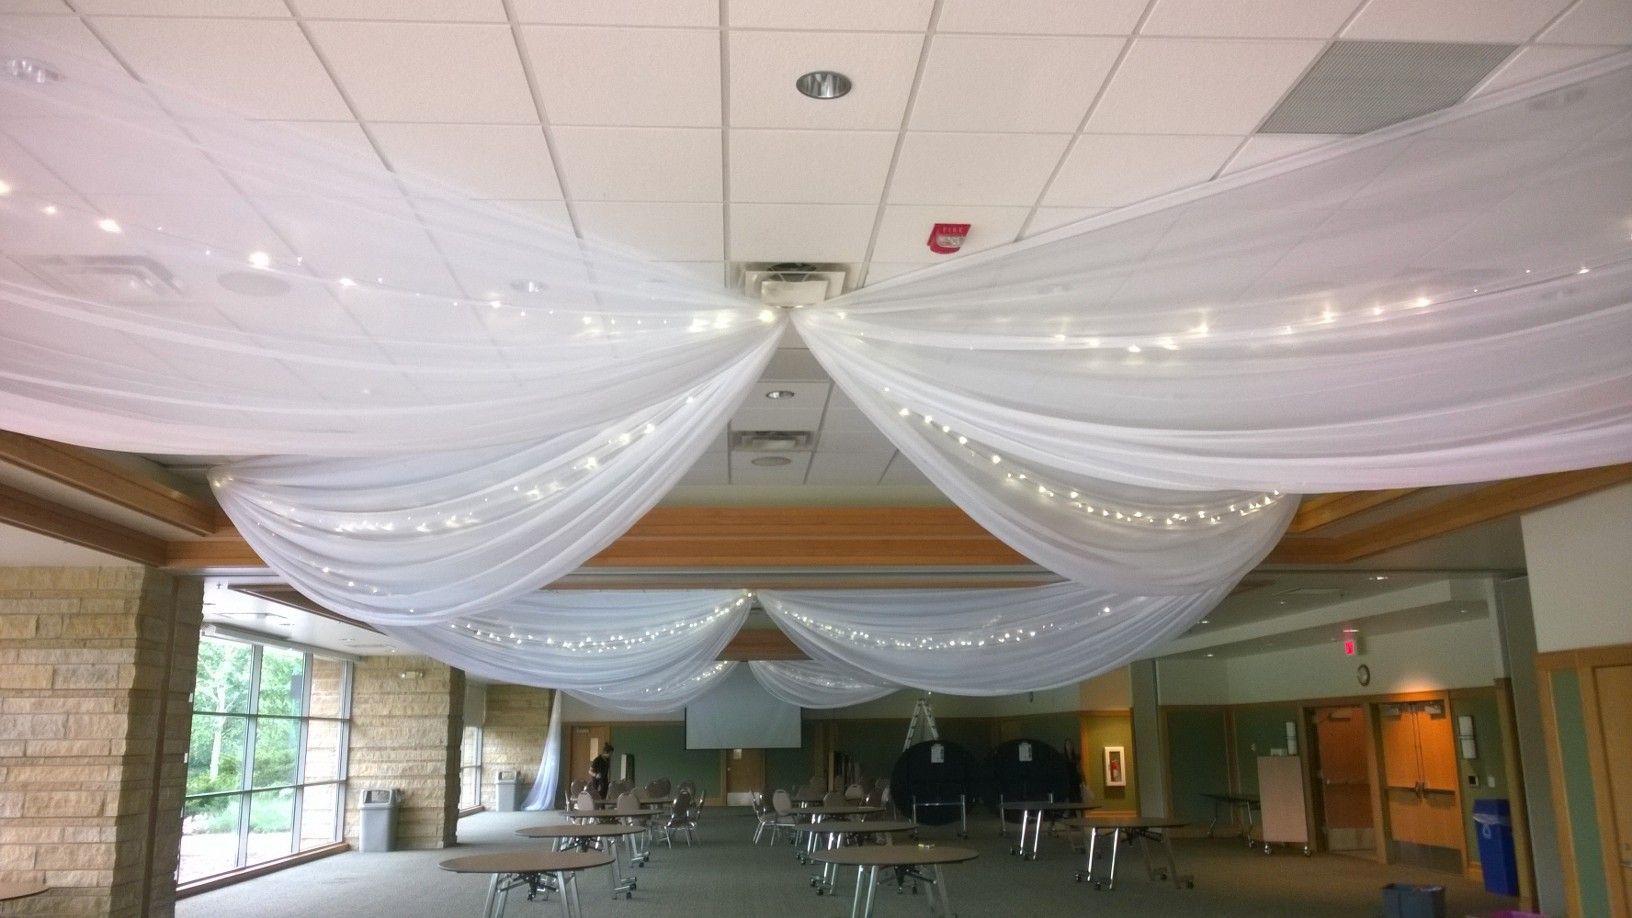 White Ceiling Drape At Eagan Community Center By Deckci Decor